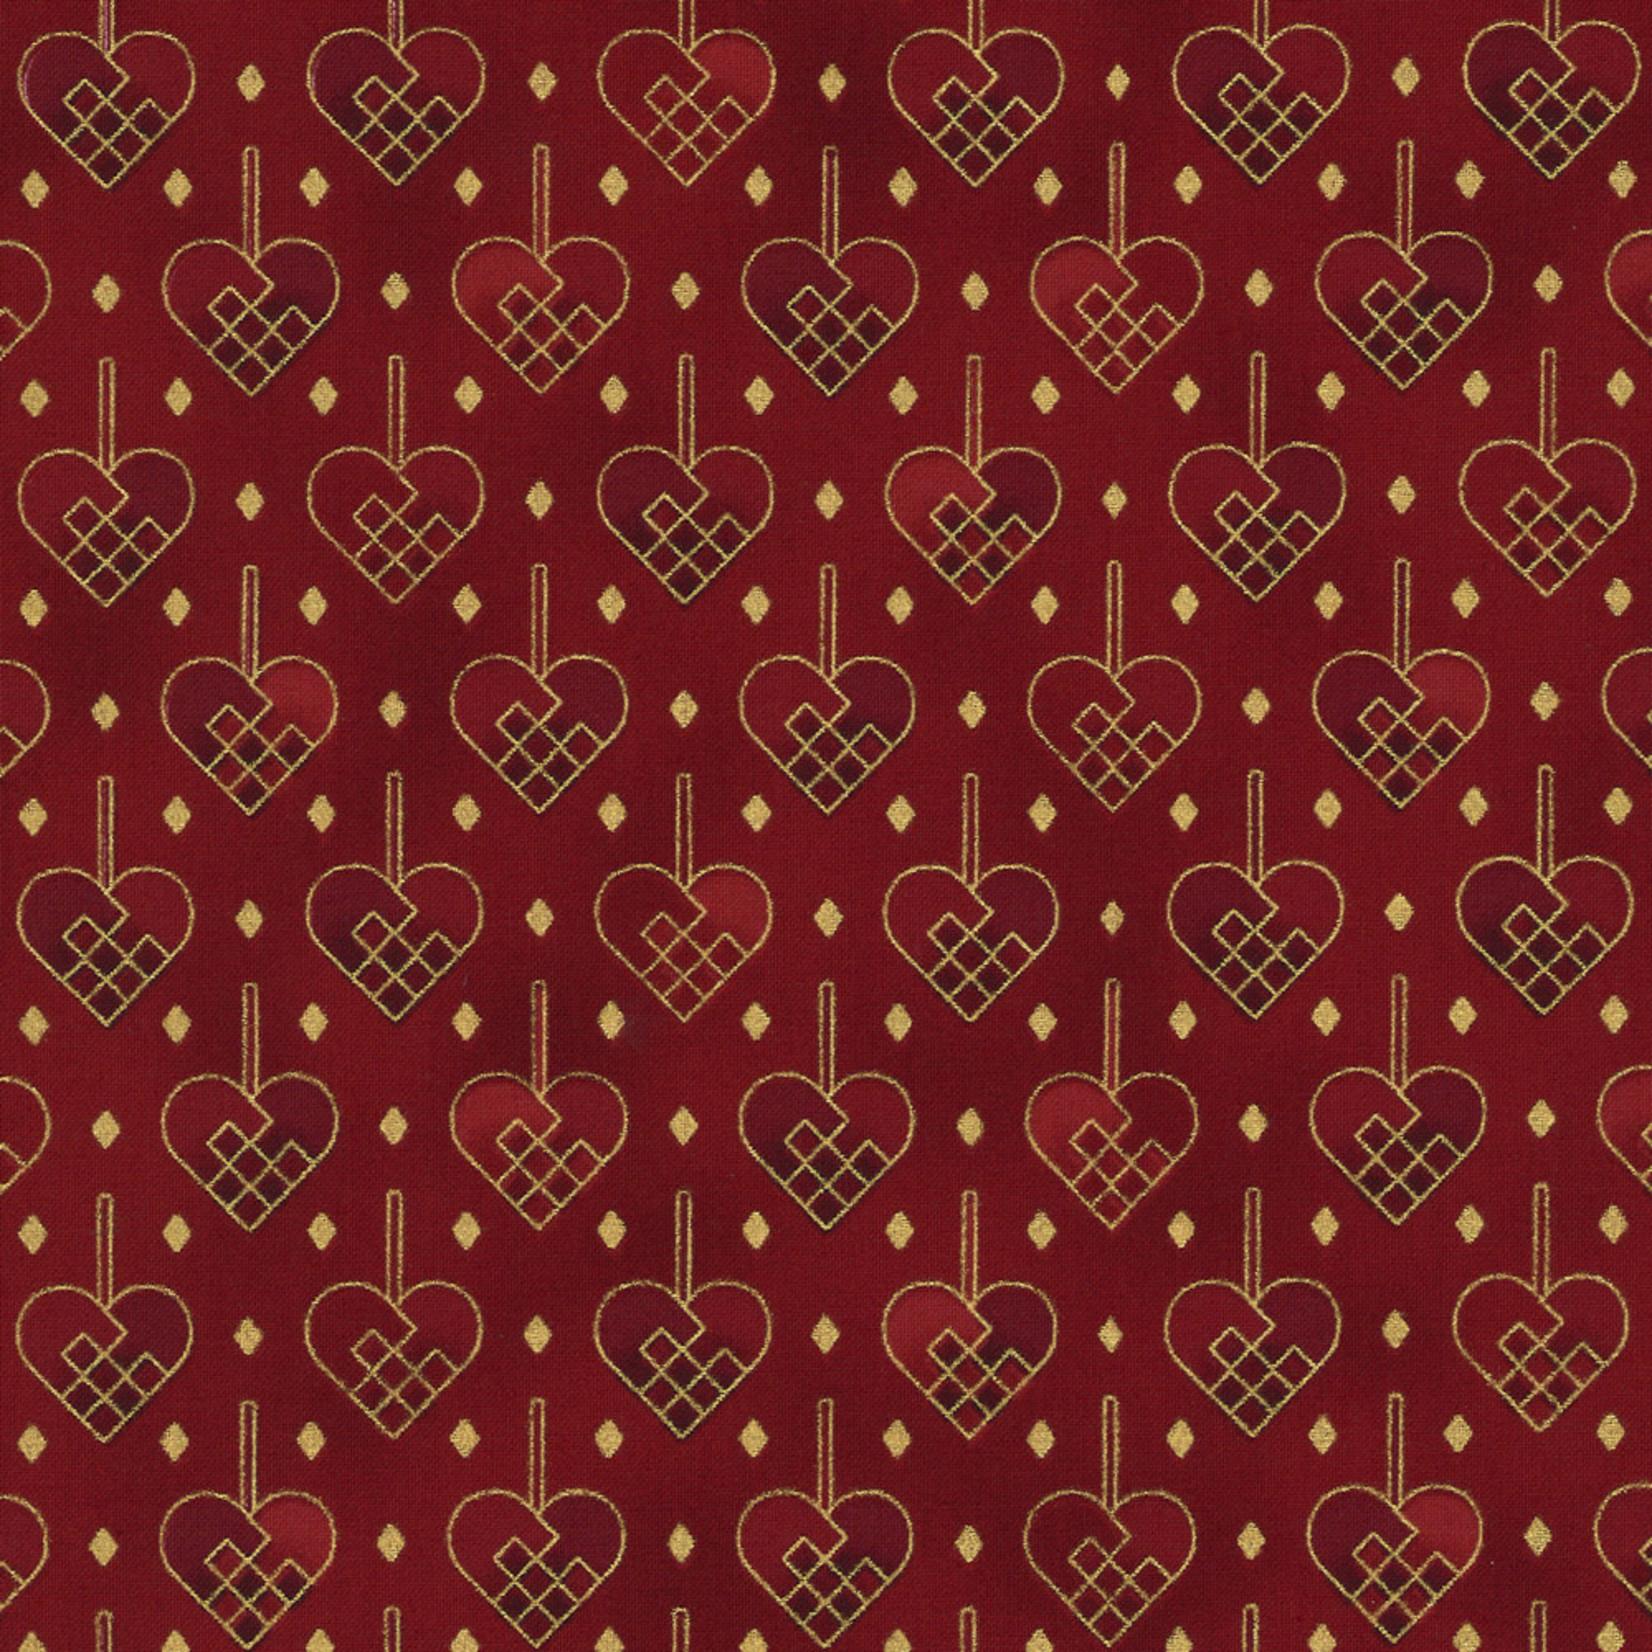 Stoffabrics Christmas Wonders - Hearts - Red Gold